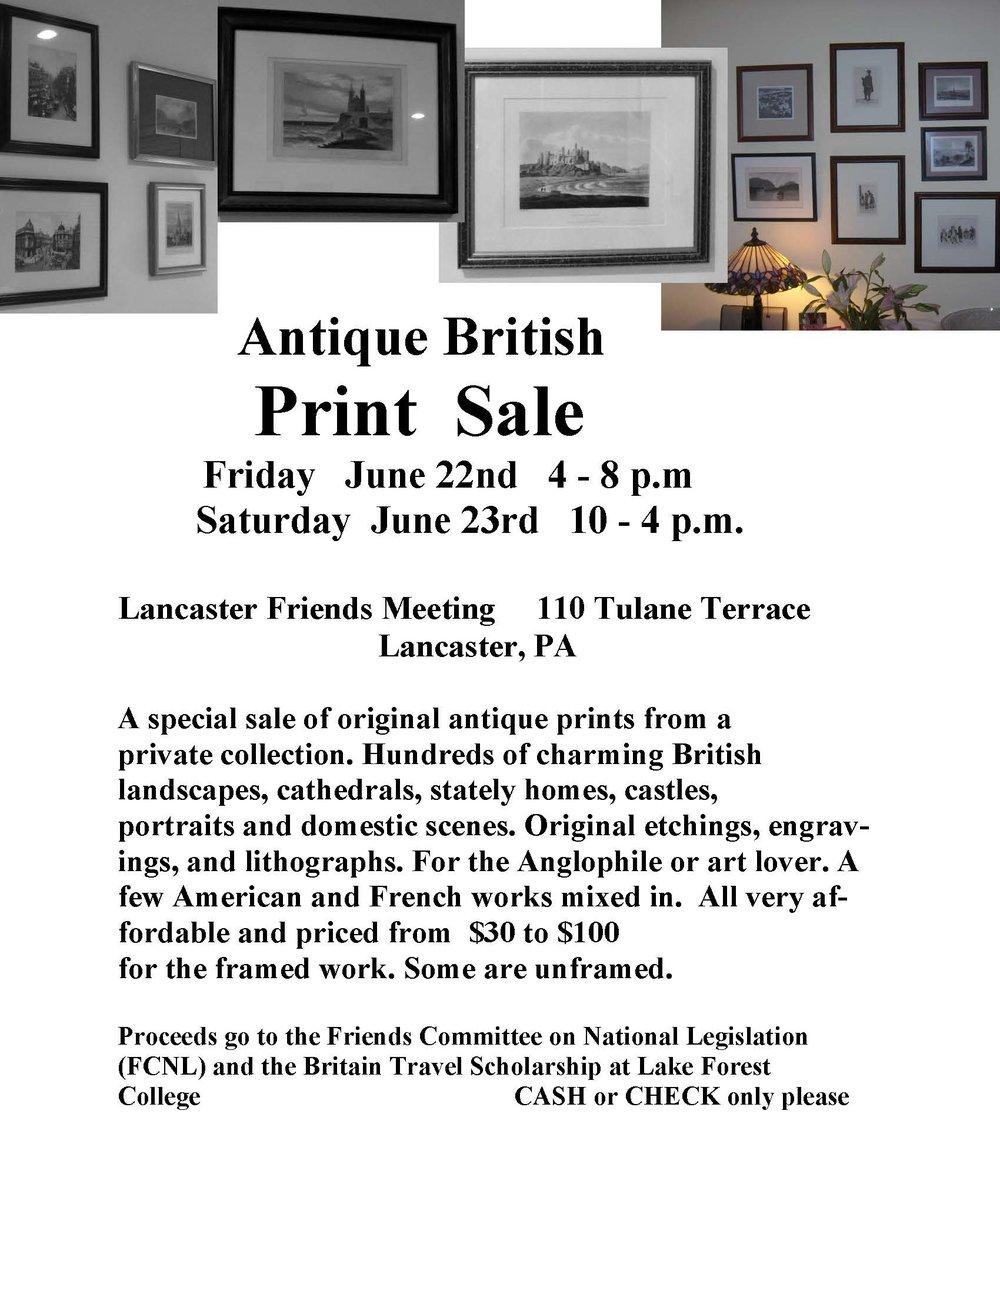 britishprintsale6-18-1.jpg